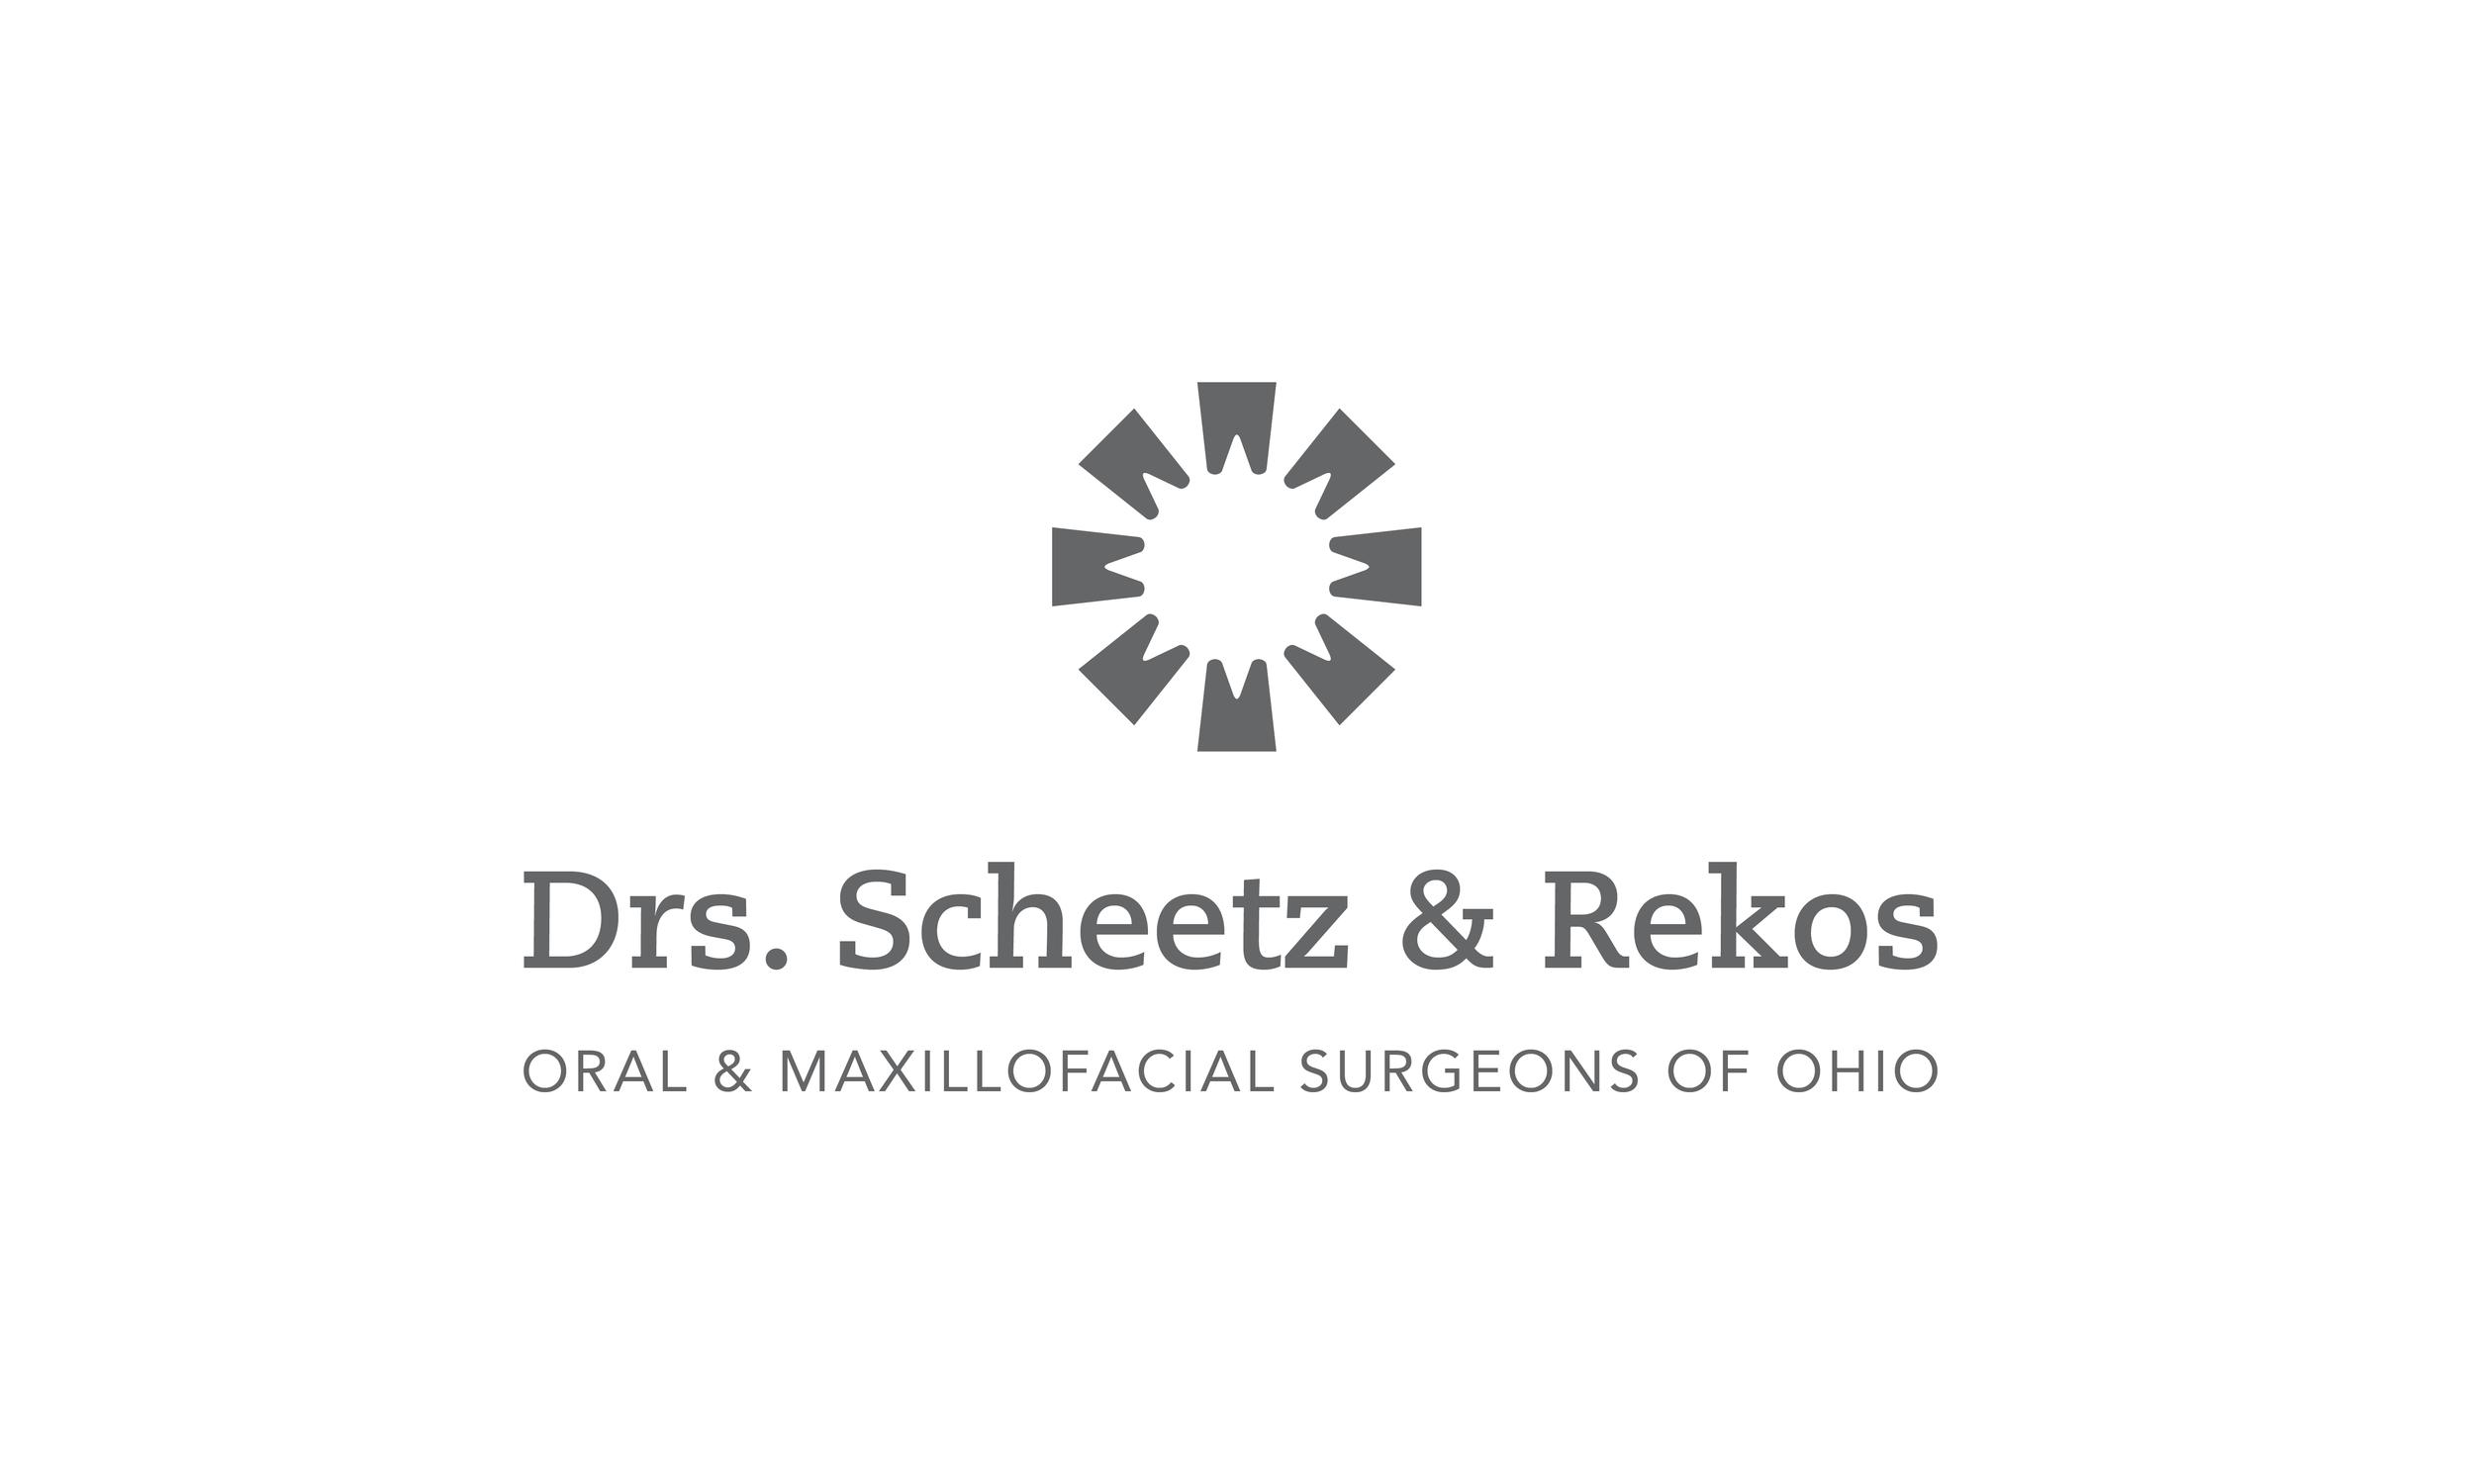 drs-scheetz-&-rekos-oral-surgery-logo.png